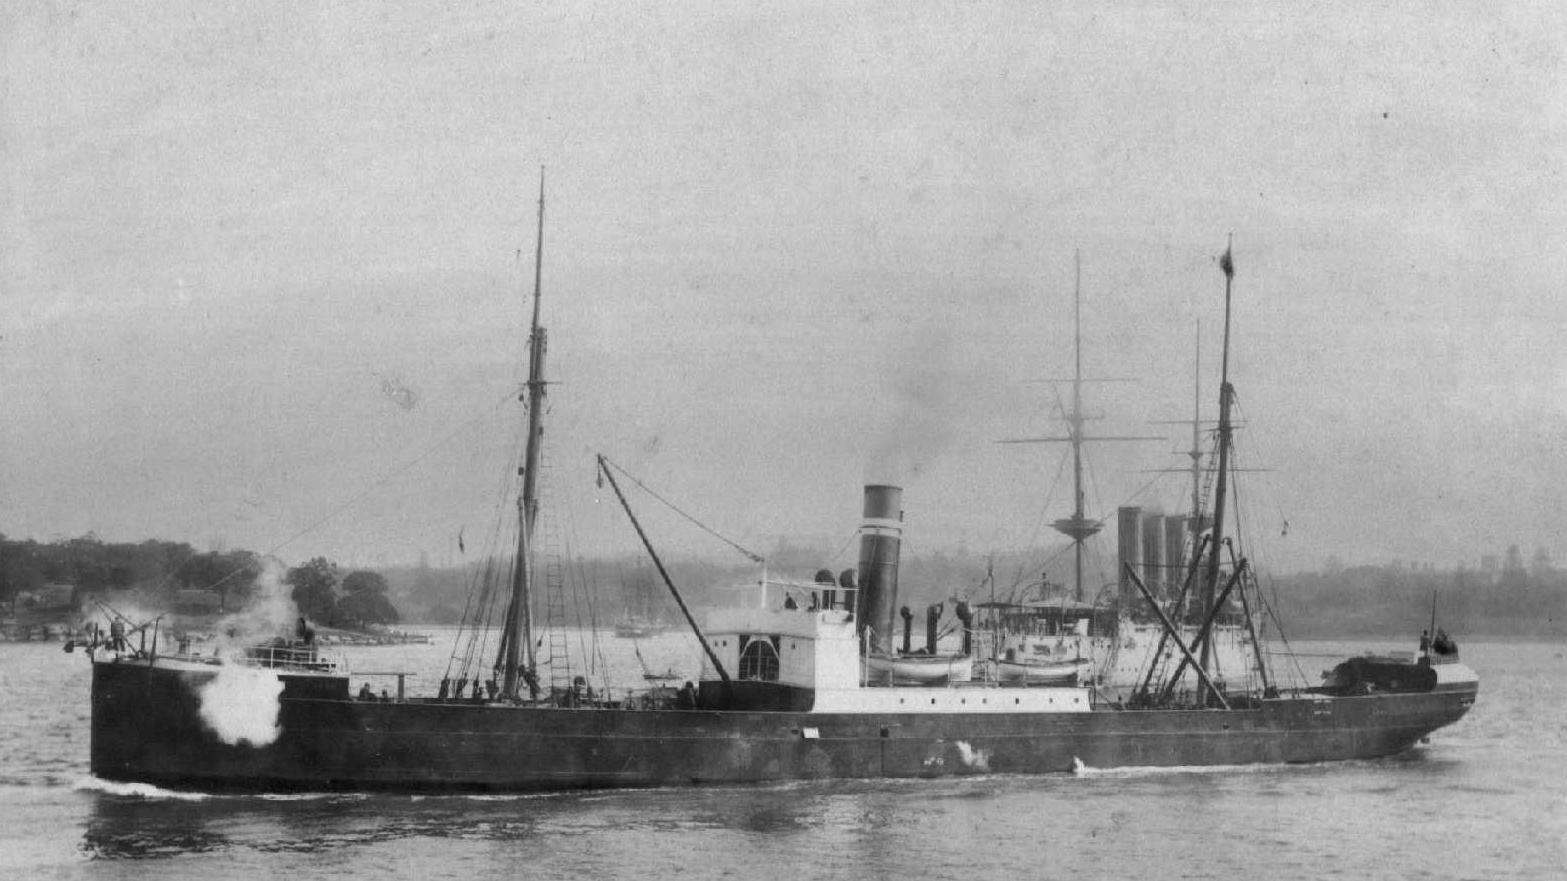 The steamer the Claud Hamilton.